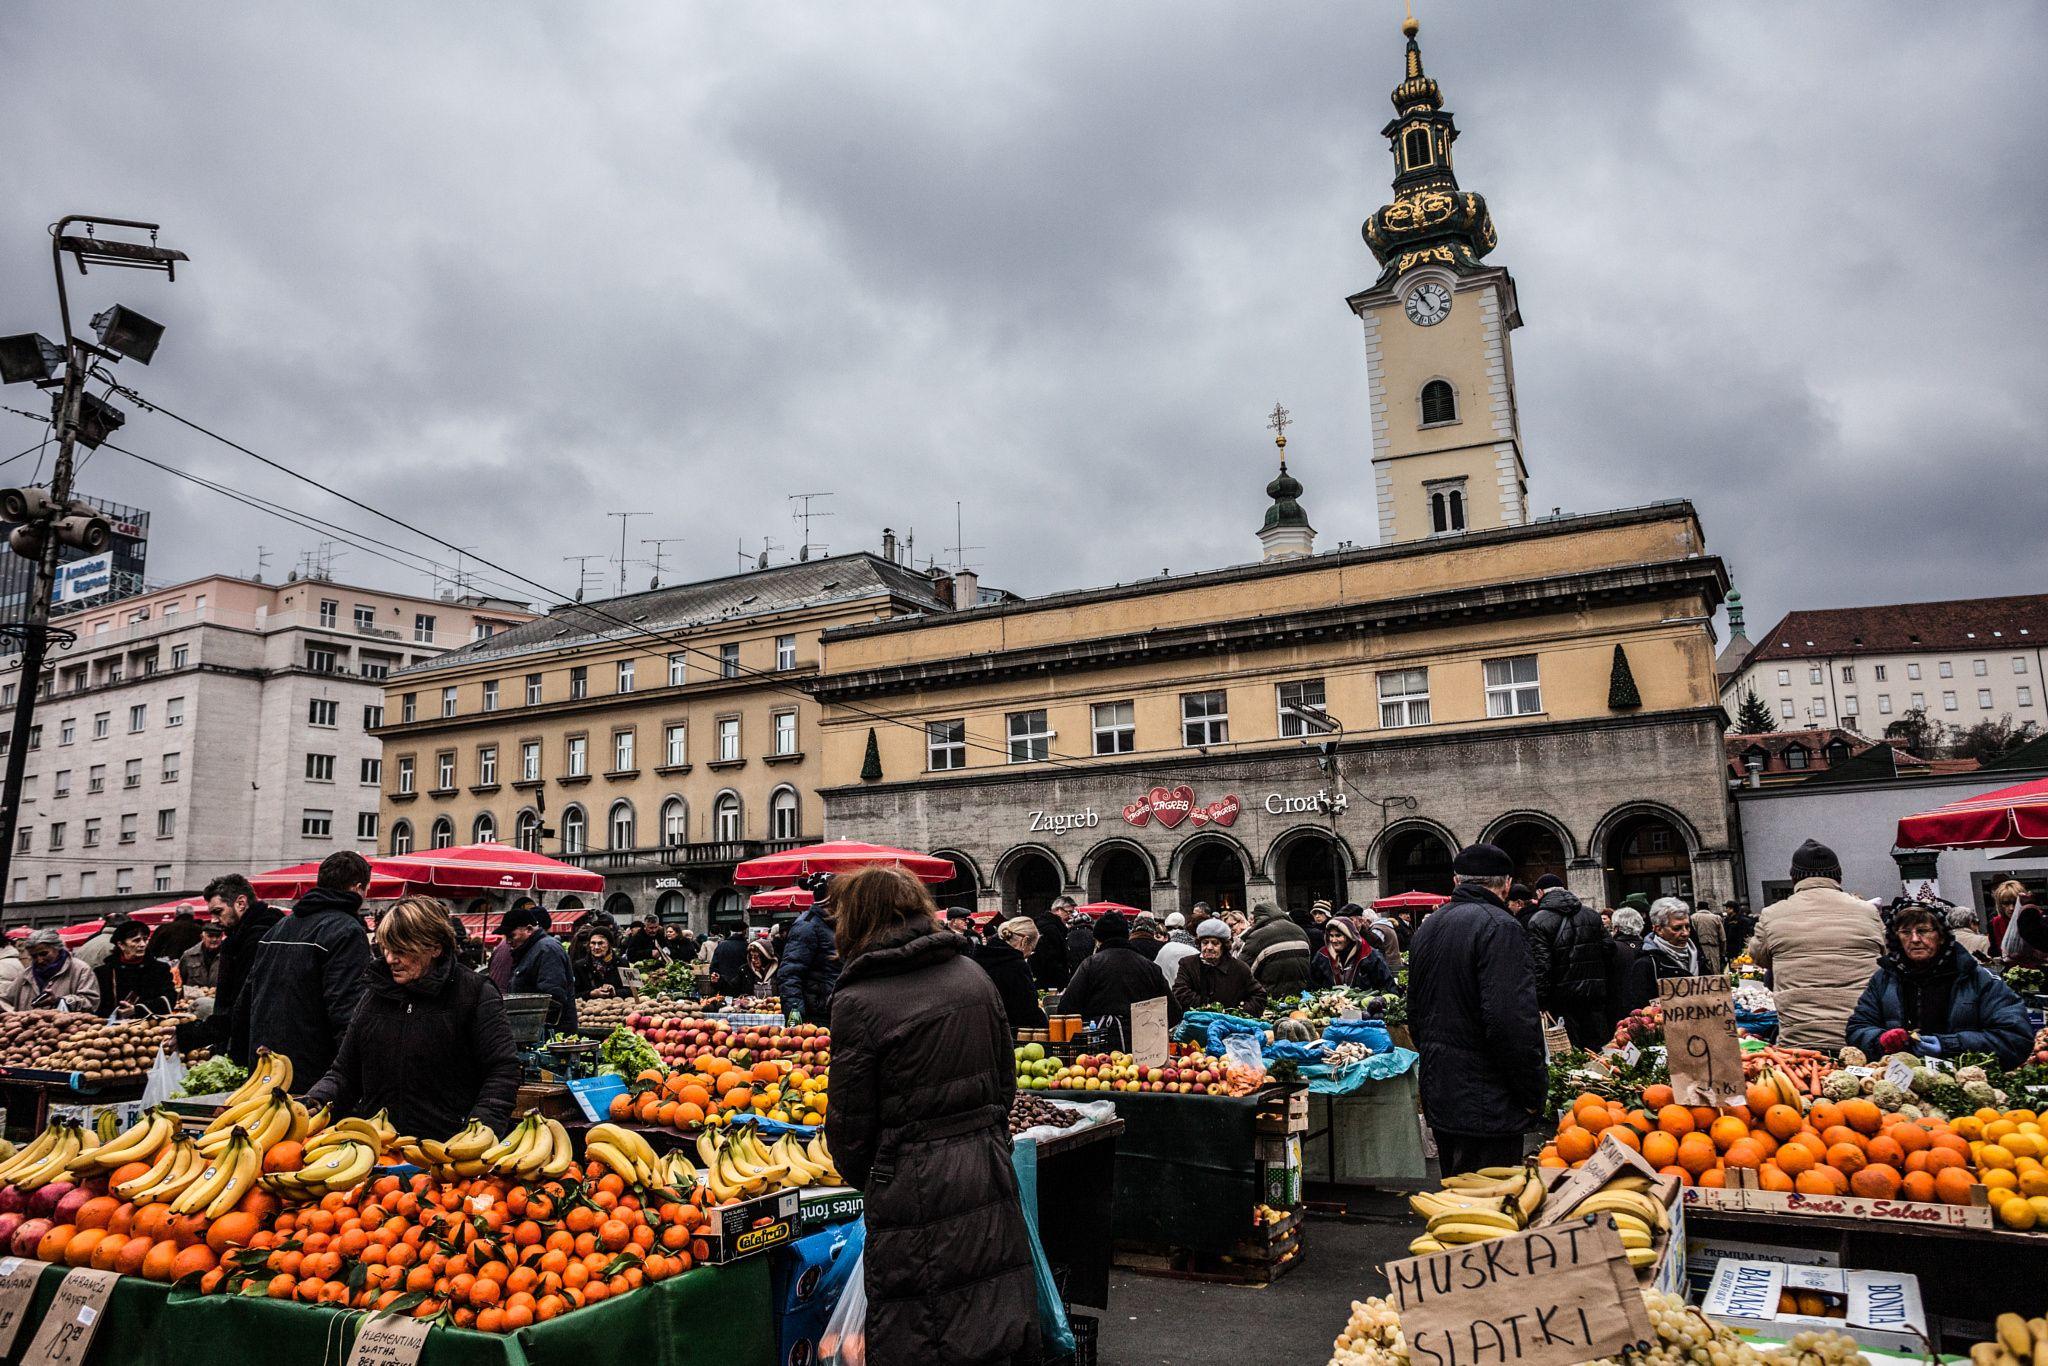 Dolac Market Dolac Pronounced Dɔ Lat S Is A Farmers Market Located In Gornji Grad Medvescak City District Of Zagreb Croat Dolac Croatia Local Farmers